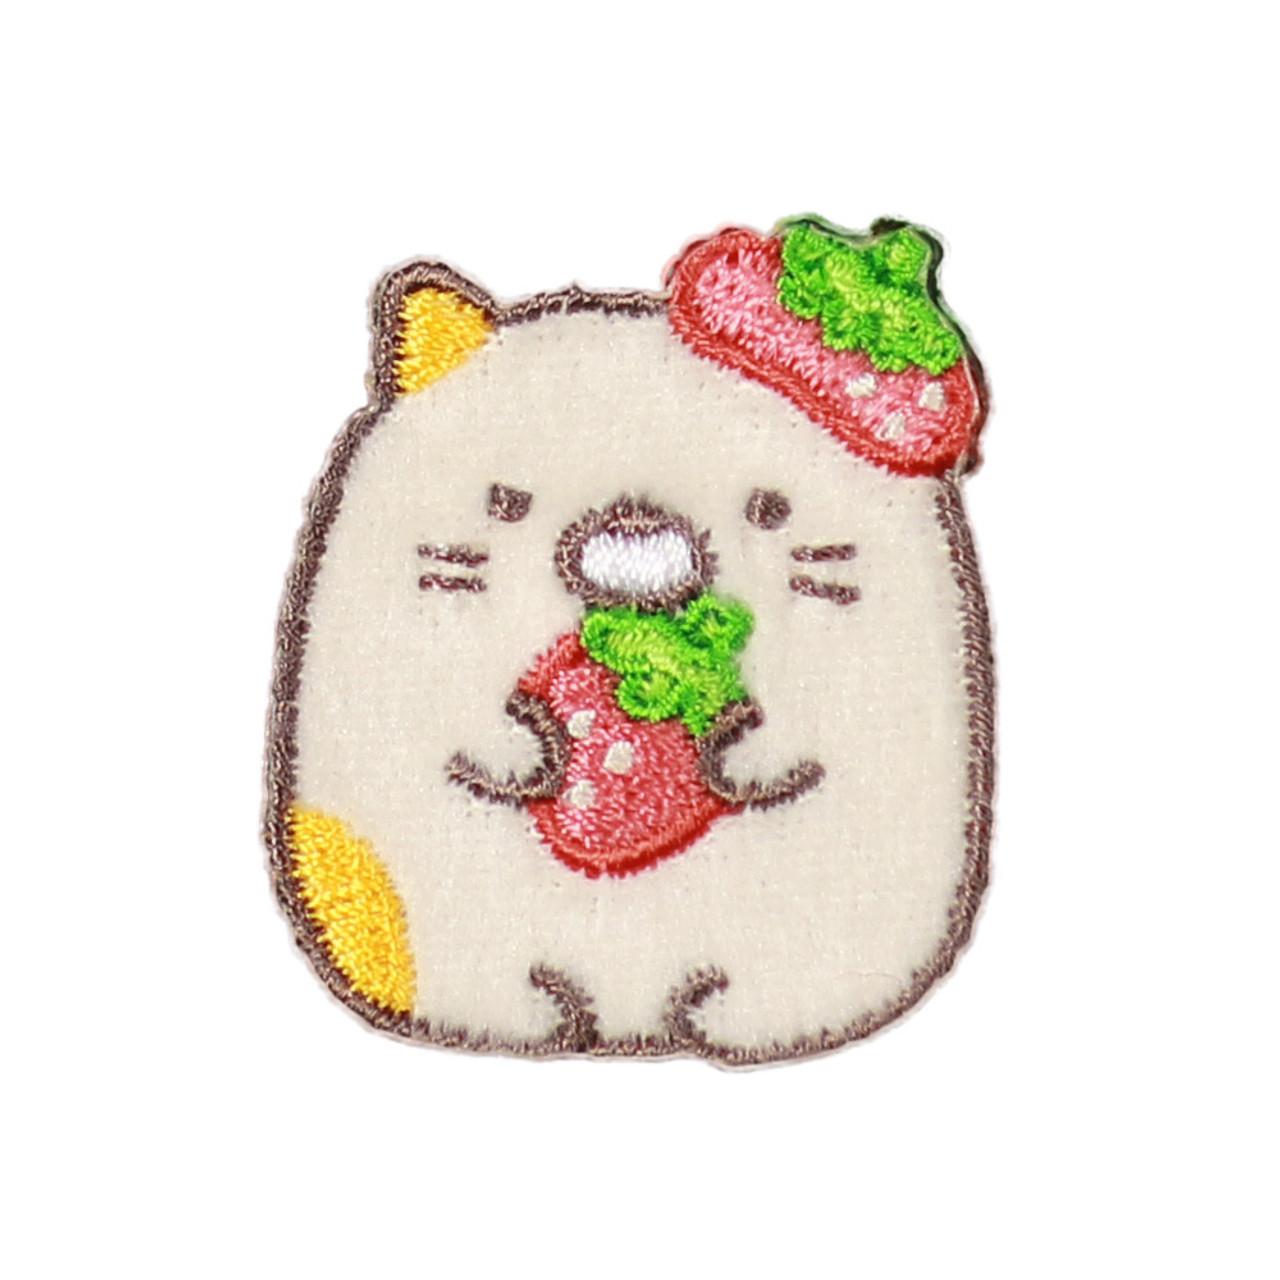 Sumikko Gurashi Iron On Patch Strawberry Neko Cat PSU132 ( Front View )